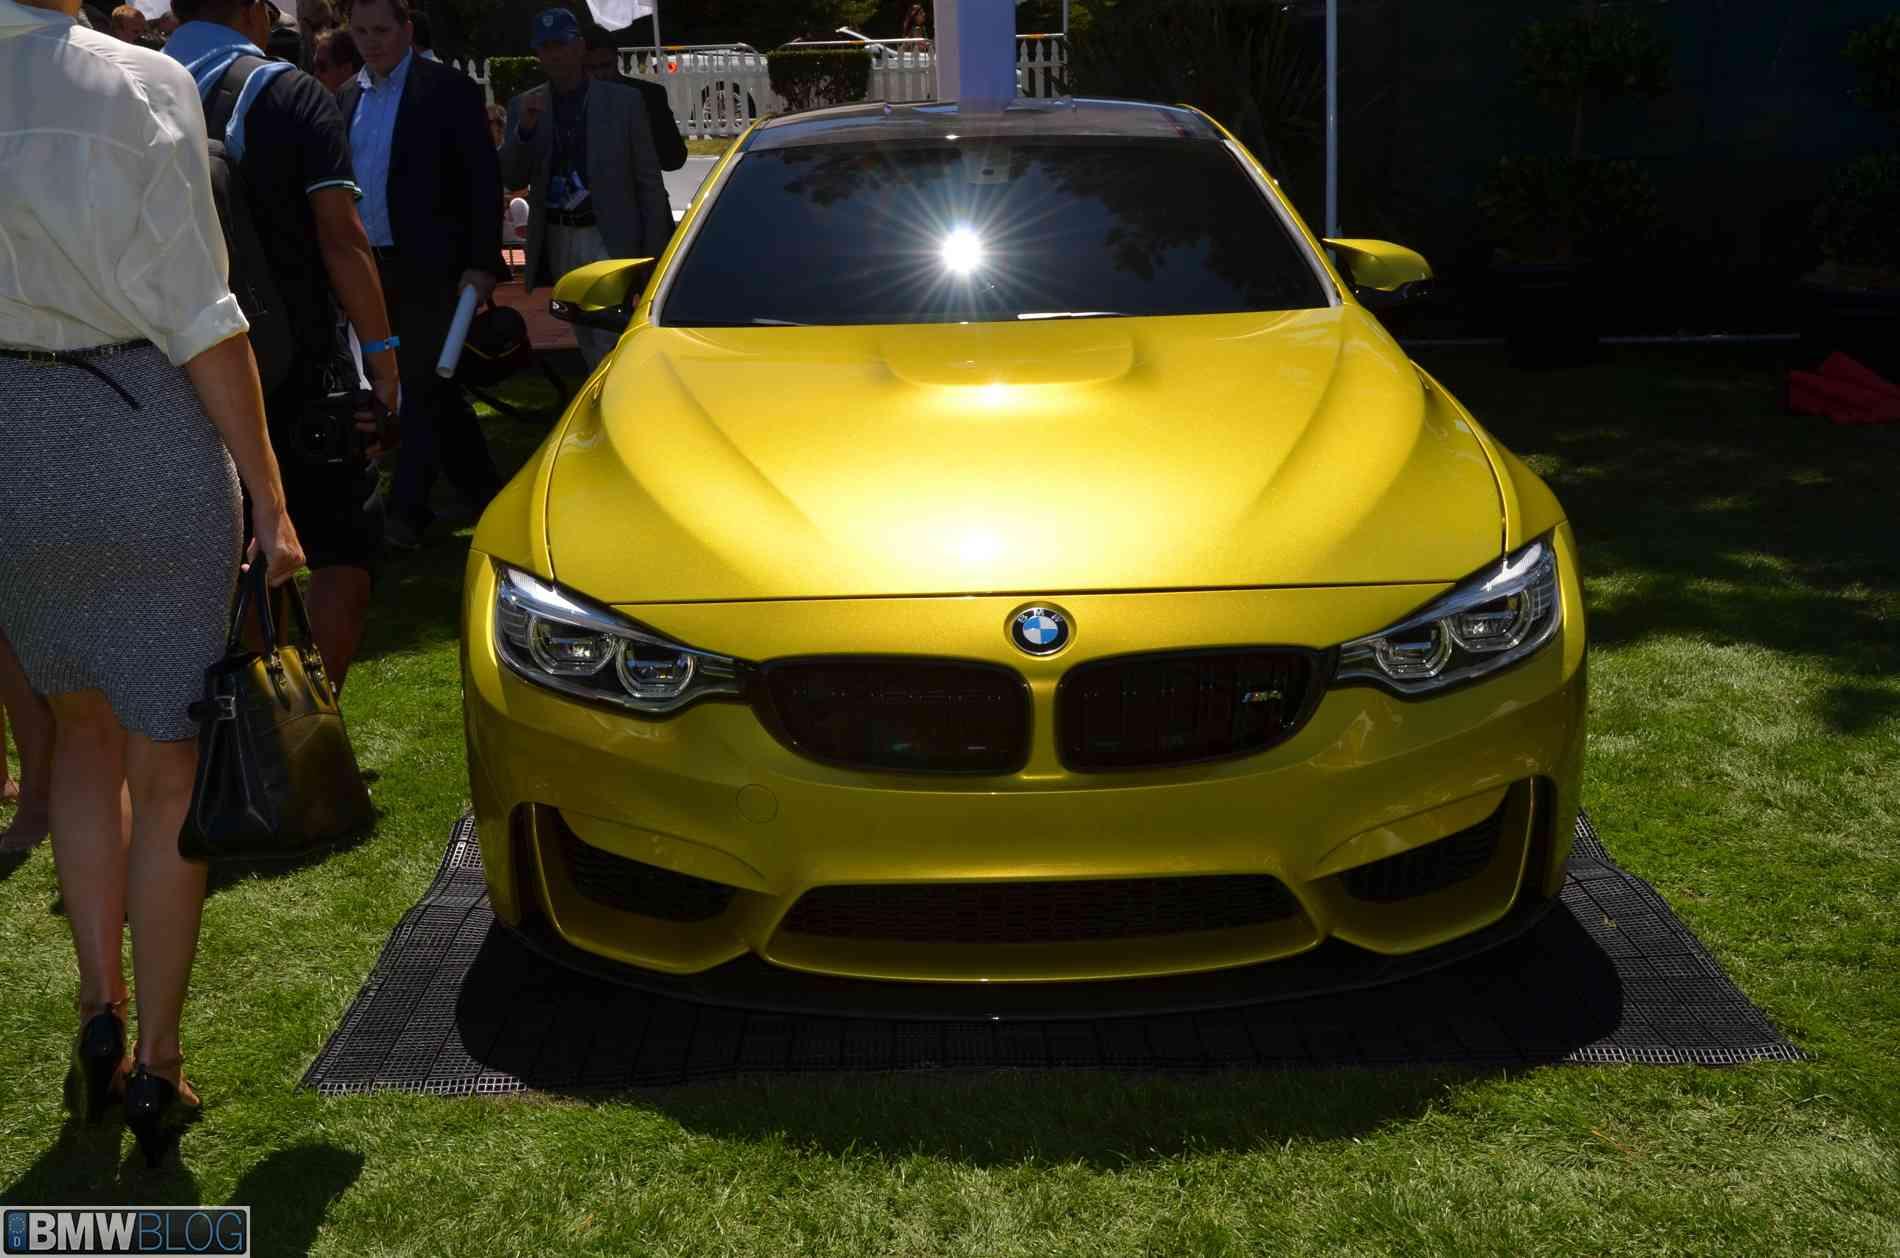 BMW concept m4 pebble beach image